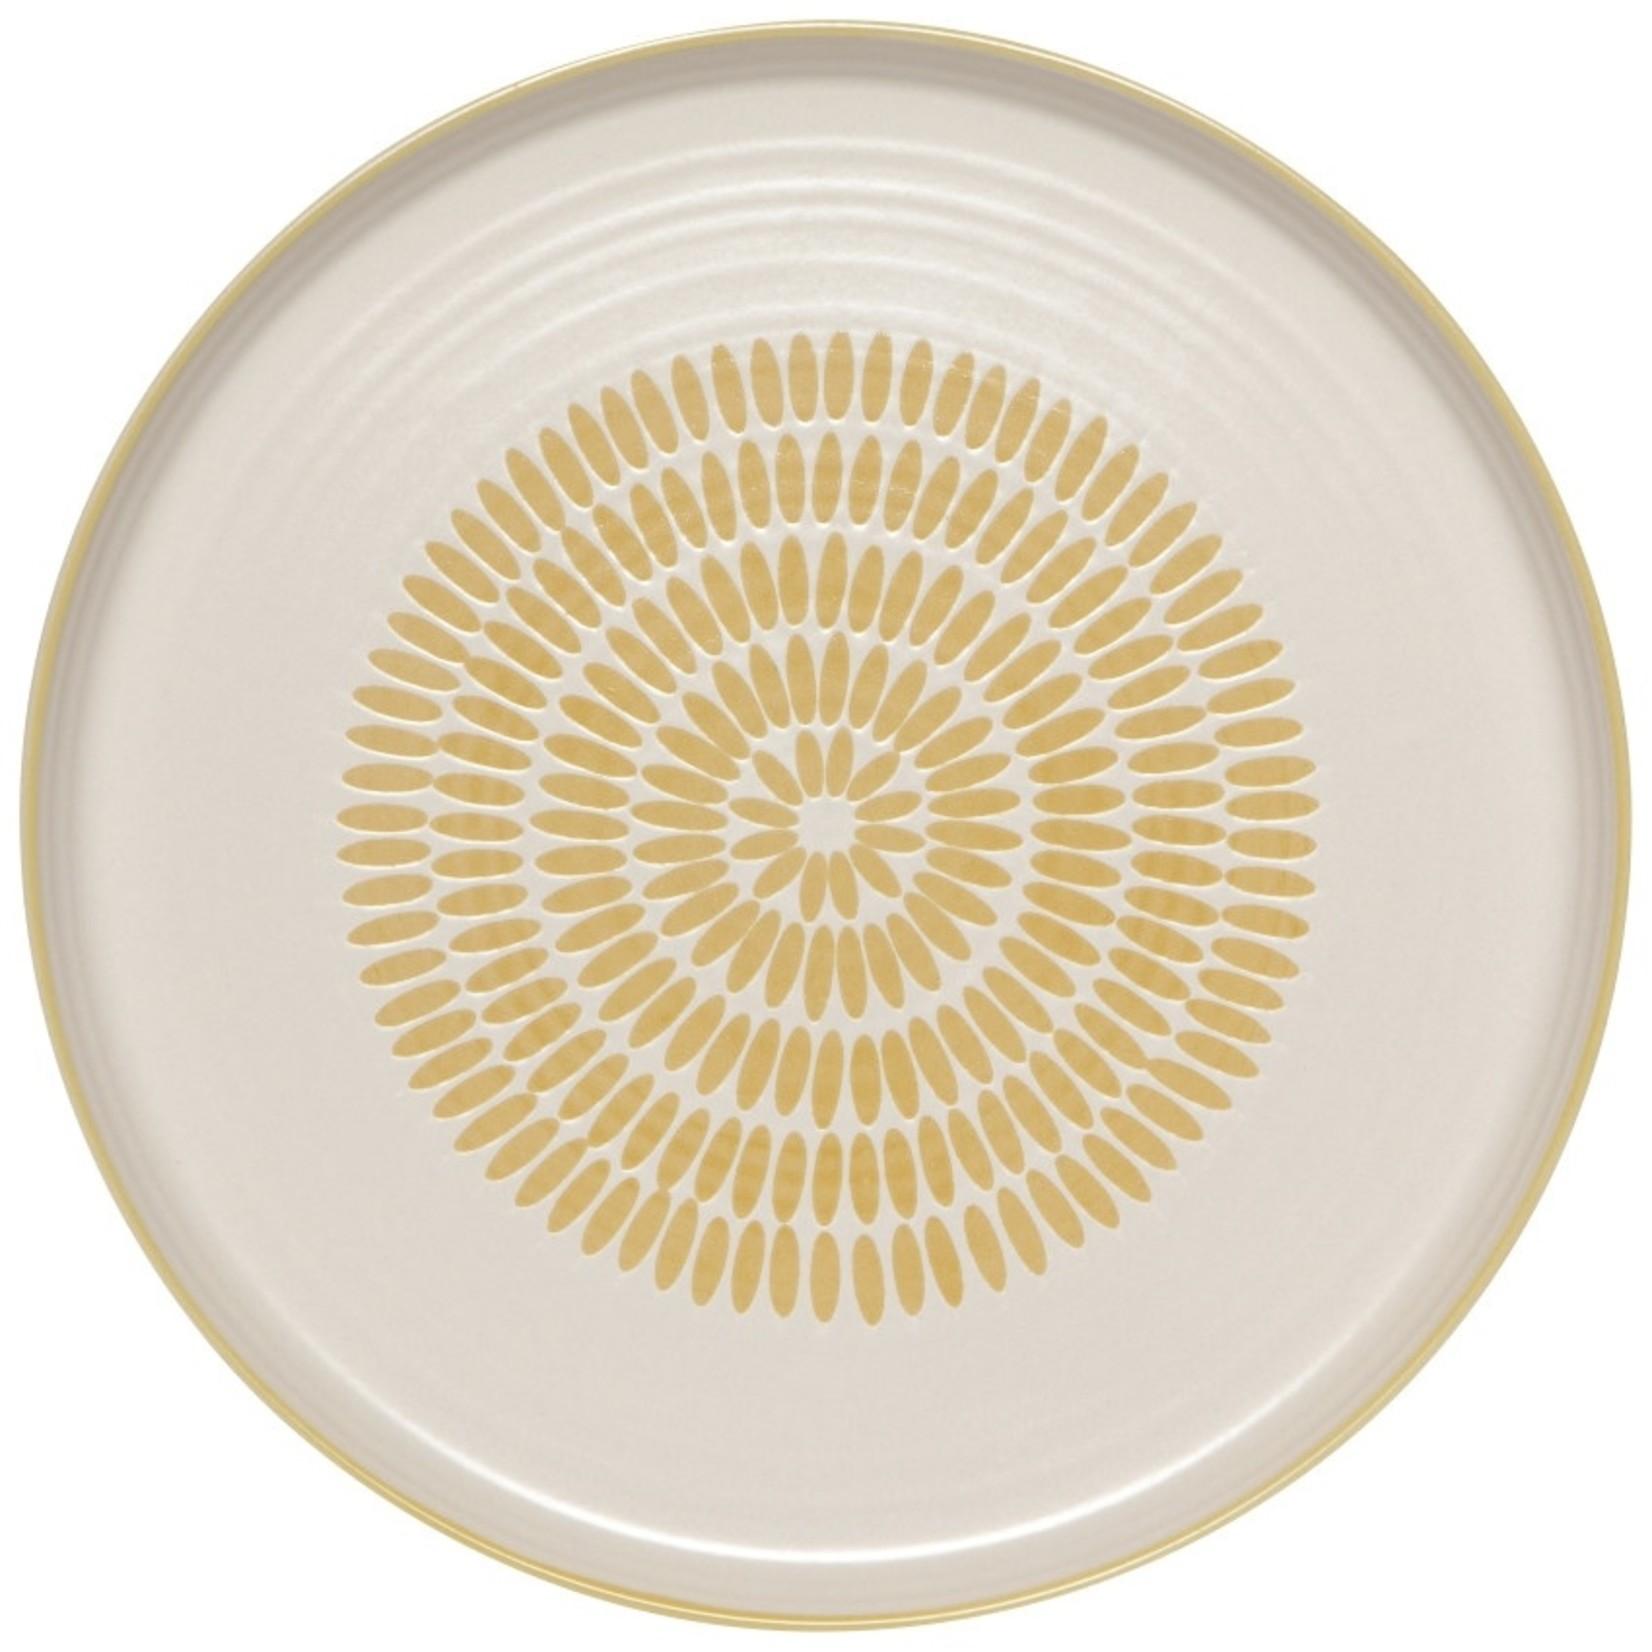 Danica Studio Imprint Dinner Plate